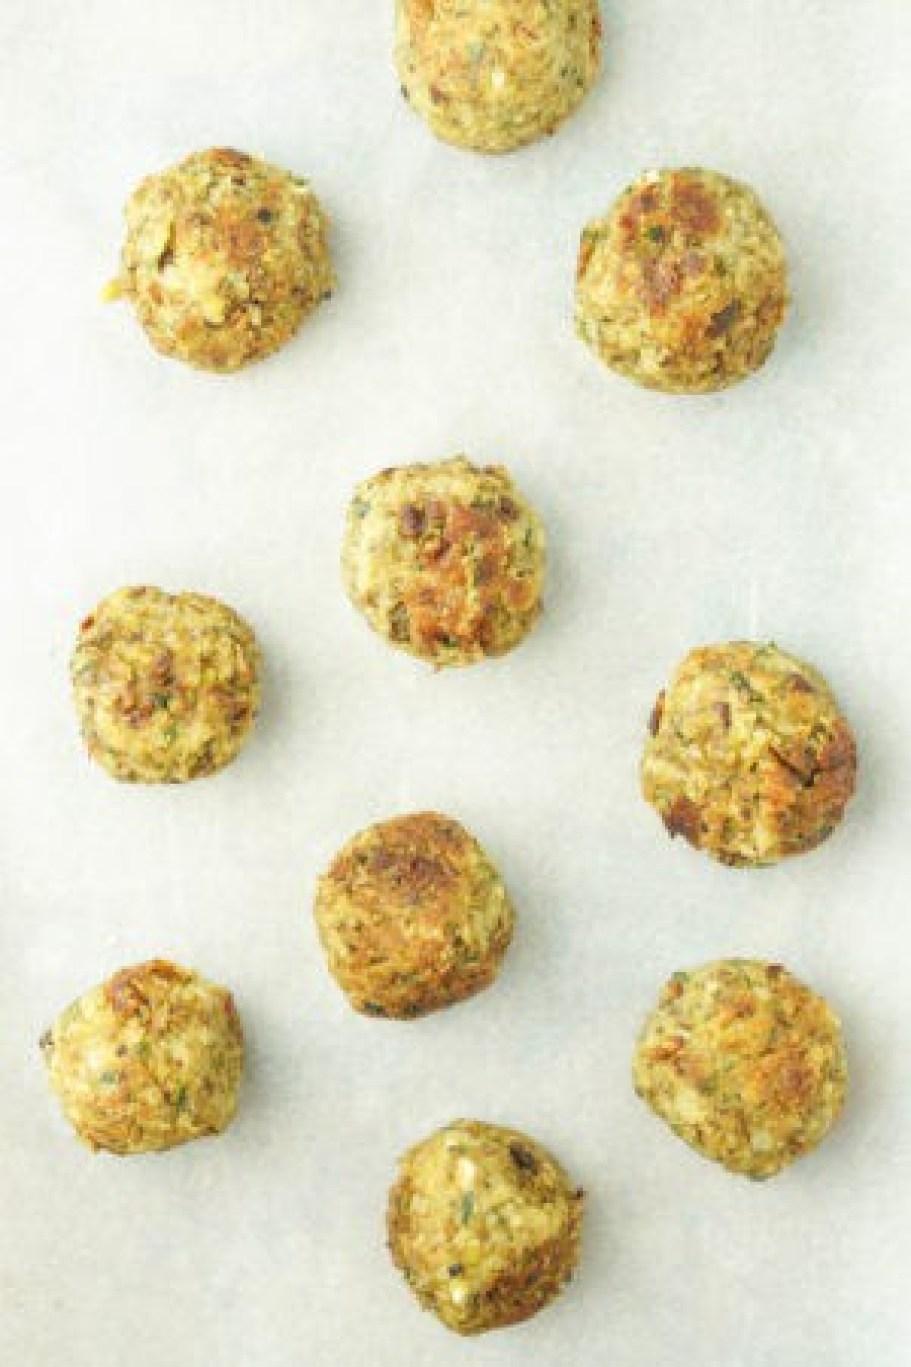 Vegetarian Lentil Mushroom Meatballs! #healthy #vegetarian #meatballs #feta #recipe - www.wakeuptowaffles.com